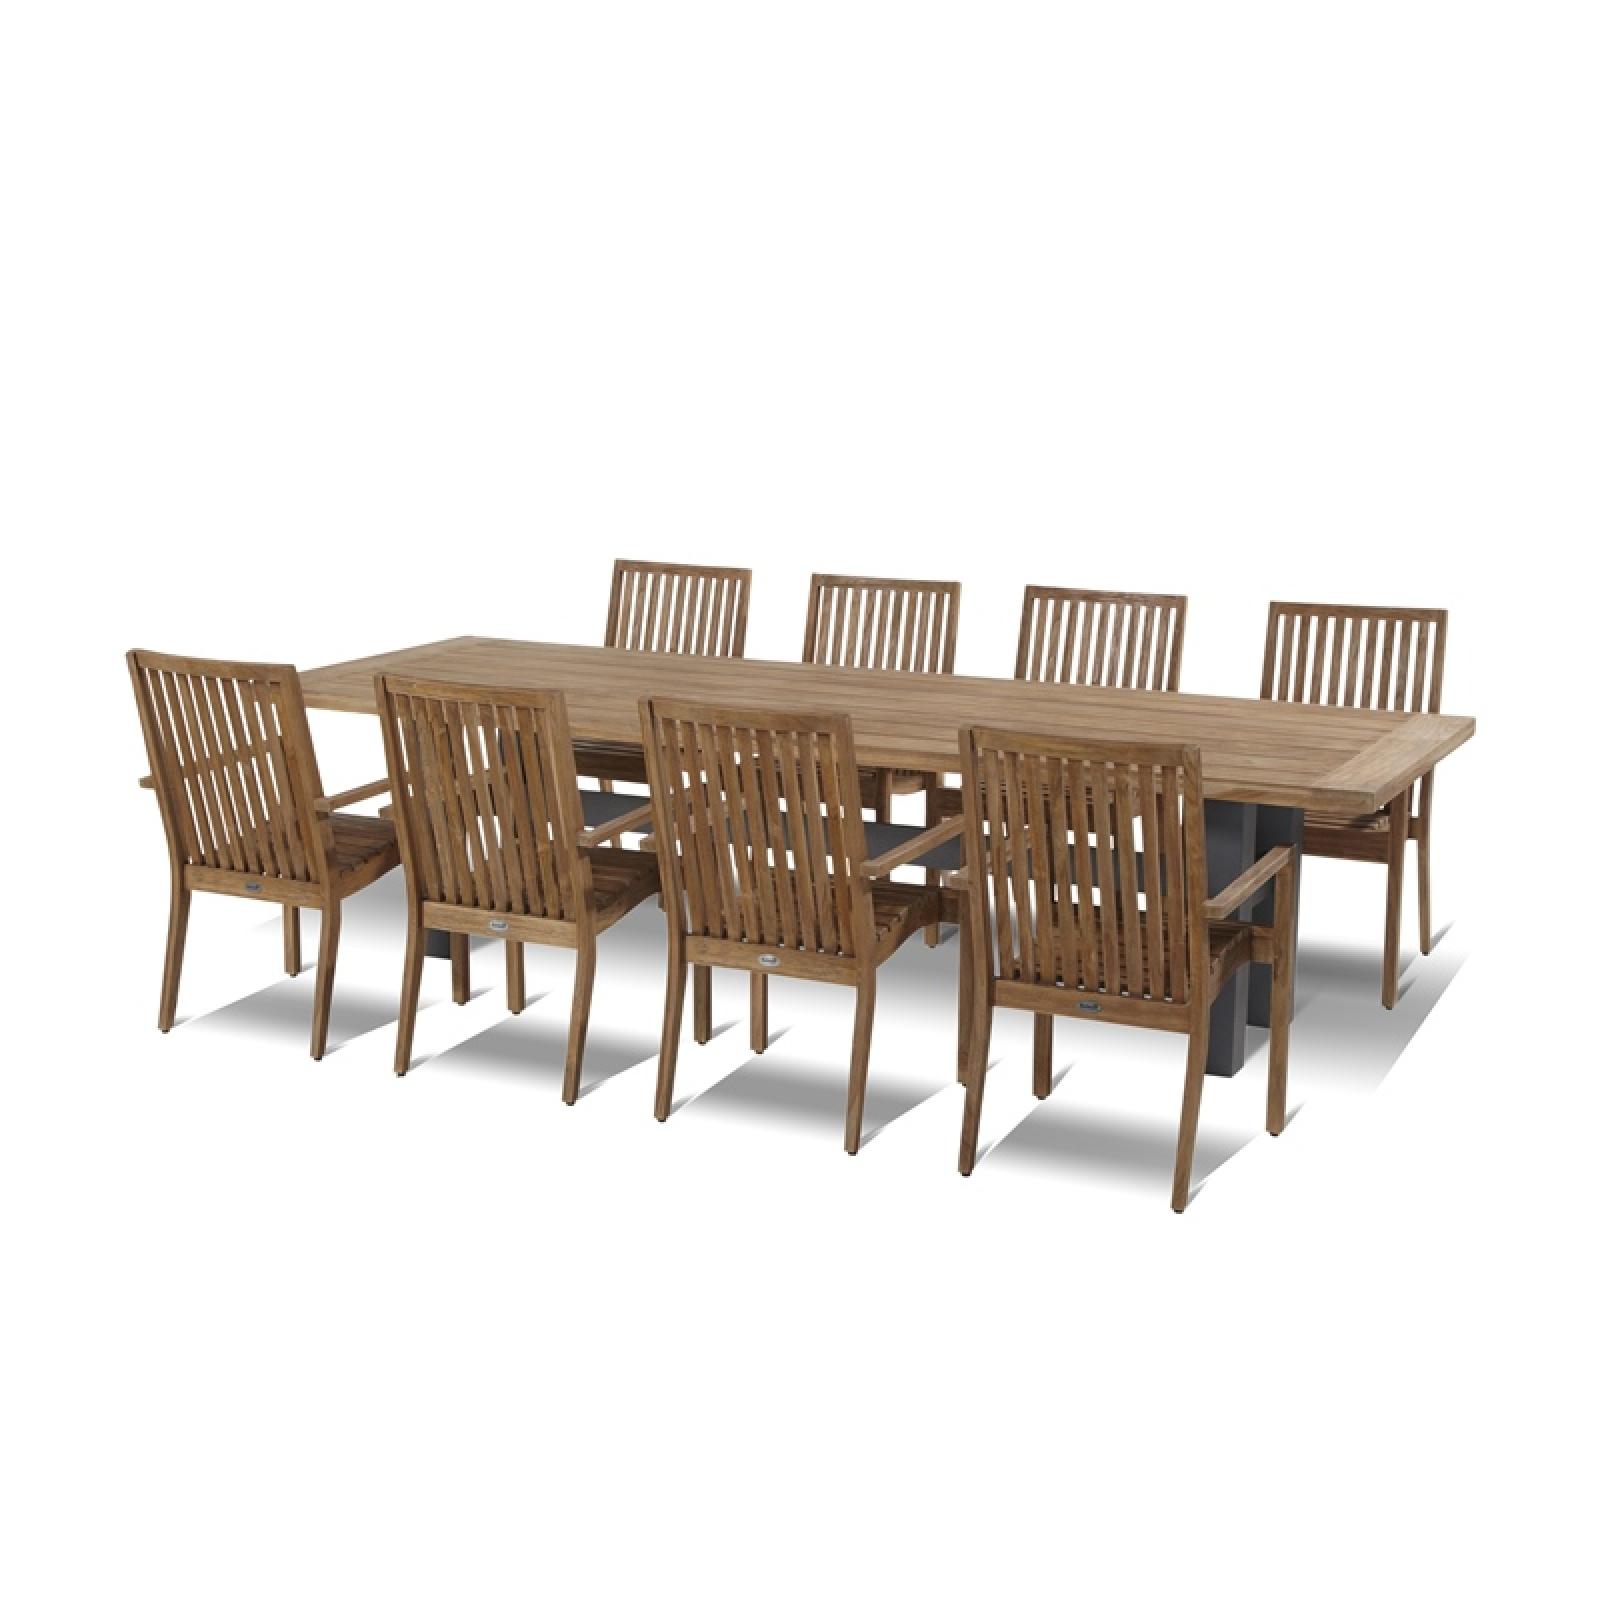 Hartman Gartenmöbelset 9teilig Tisch Teak/Alu 300x100 cm inkl Stühle ...